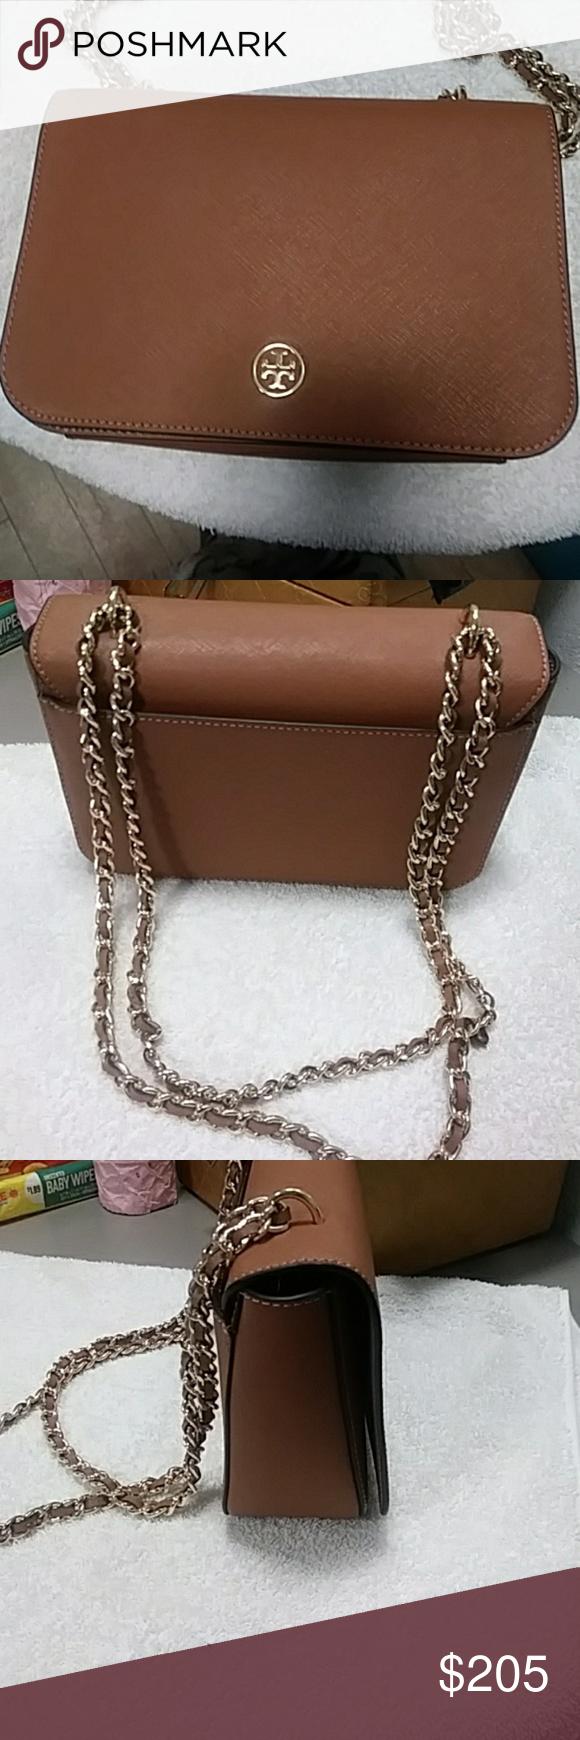 f80e601b4cf5 Tory burch emerson adjustable shoulder bag Excellent condition Tory Burch  Bags Shoulder Bags